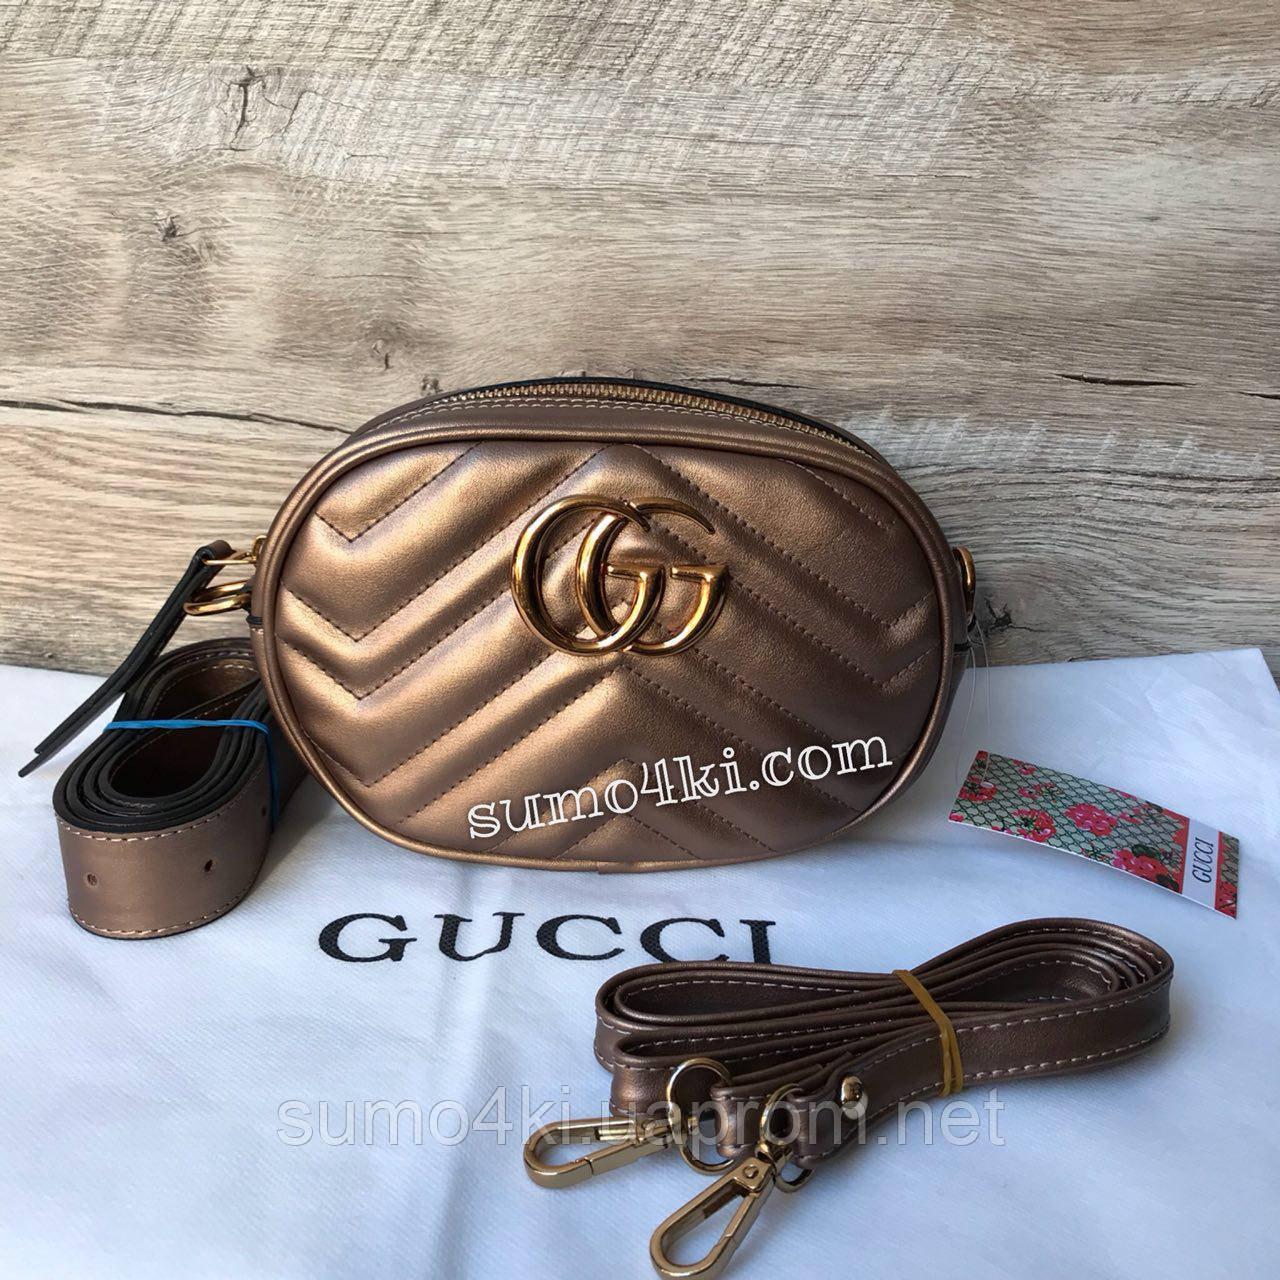 Женская сумка на пояс Gucci Marmont Гуччи - Интернет-магазин «Галерея Сумок»  в 62aa2143224